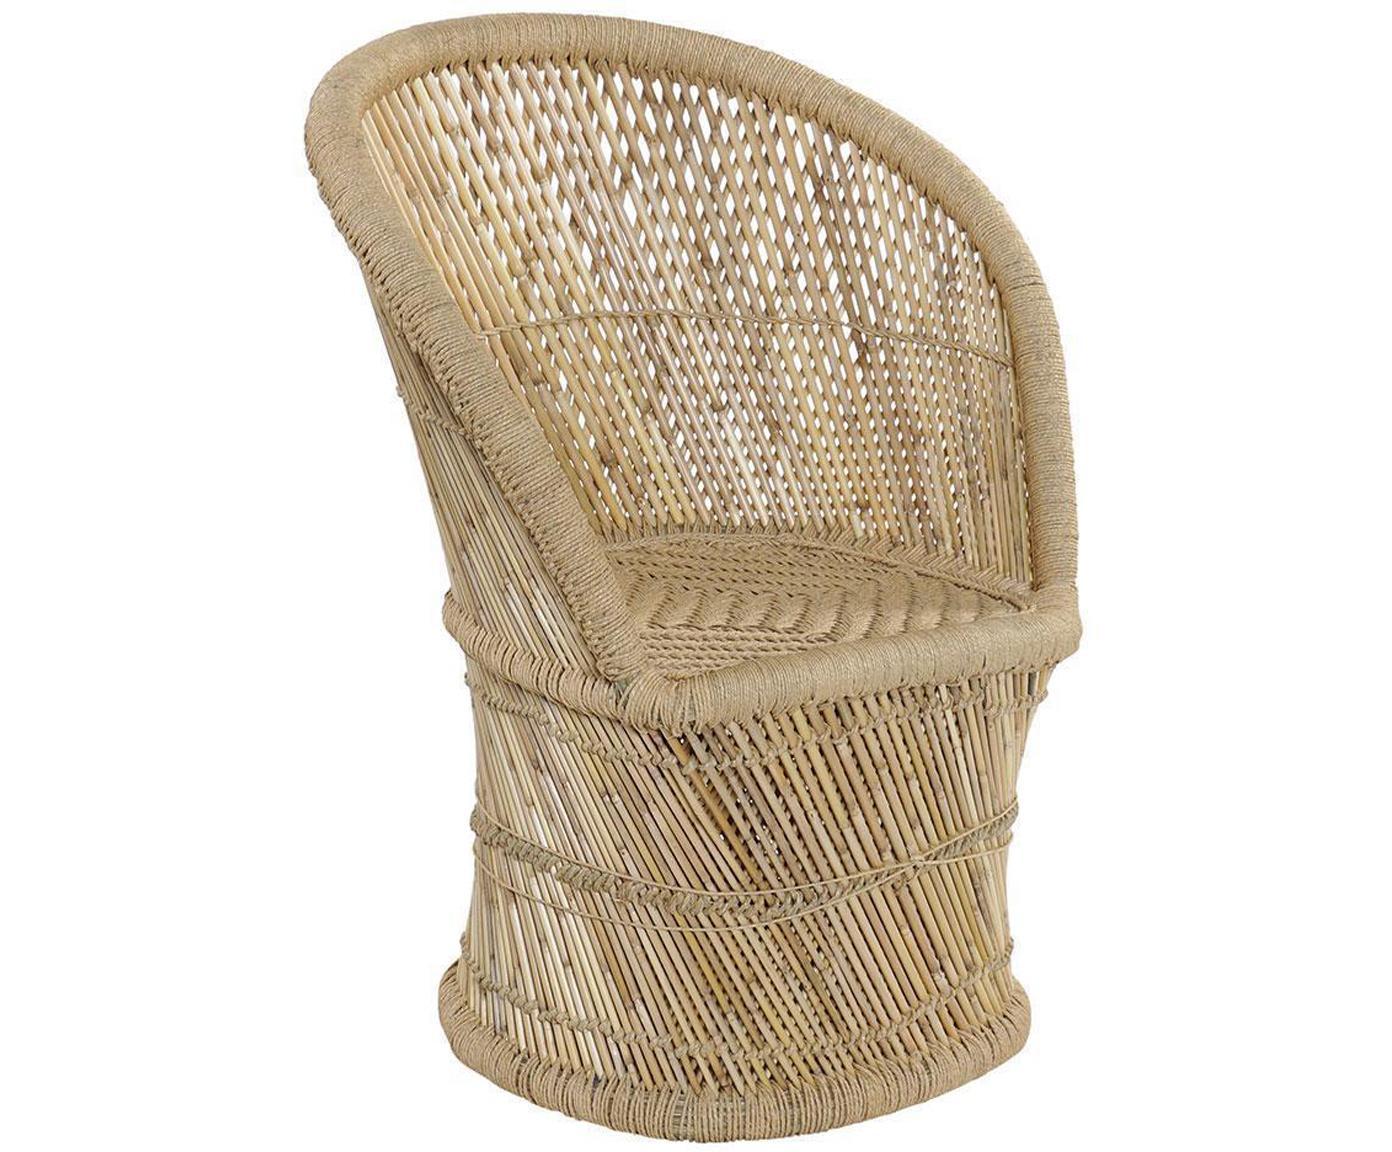 Silla con reposabrazos Crudi, Bambú, cuerda, Beige, An 68 x F 48 cm